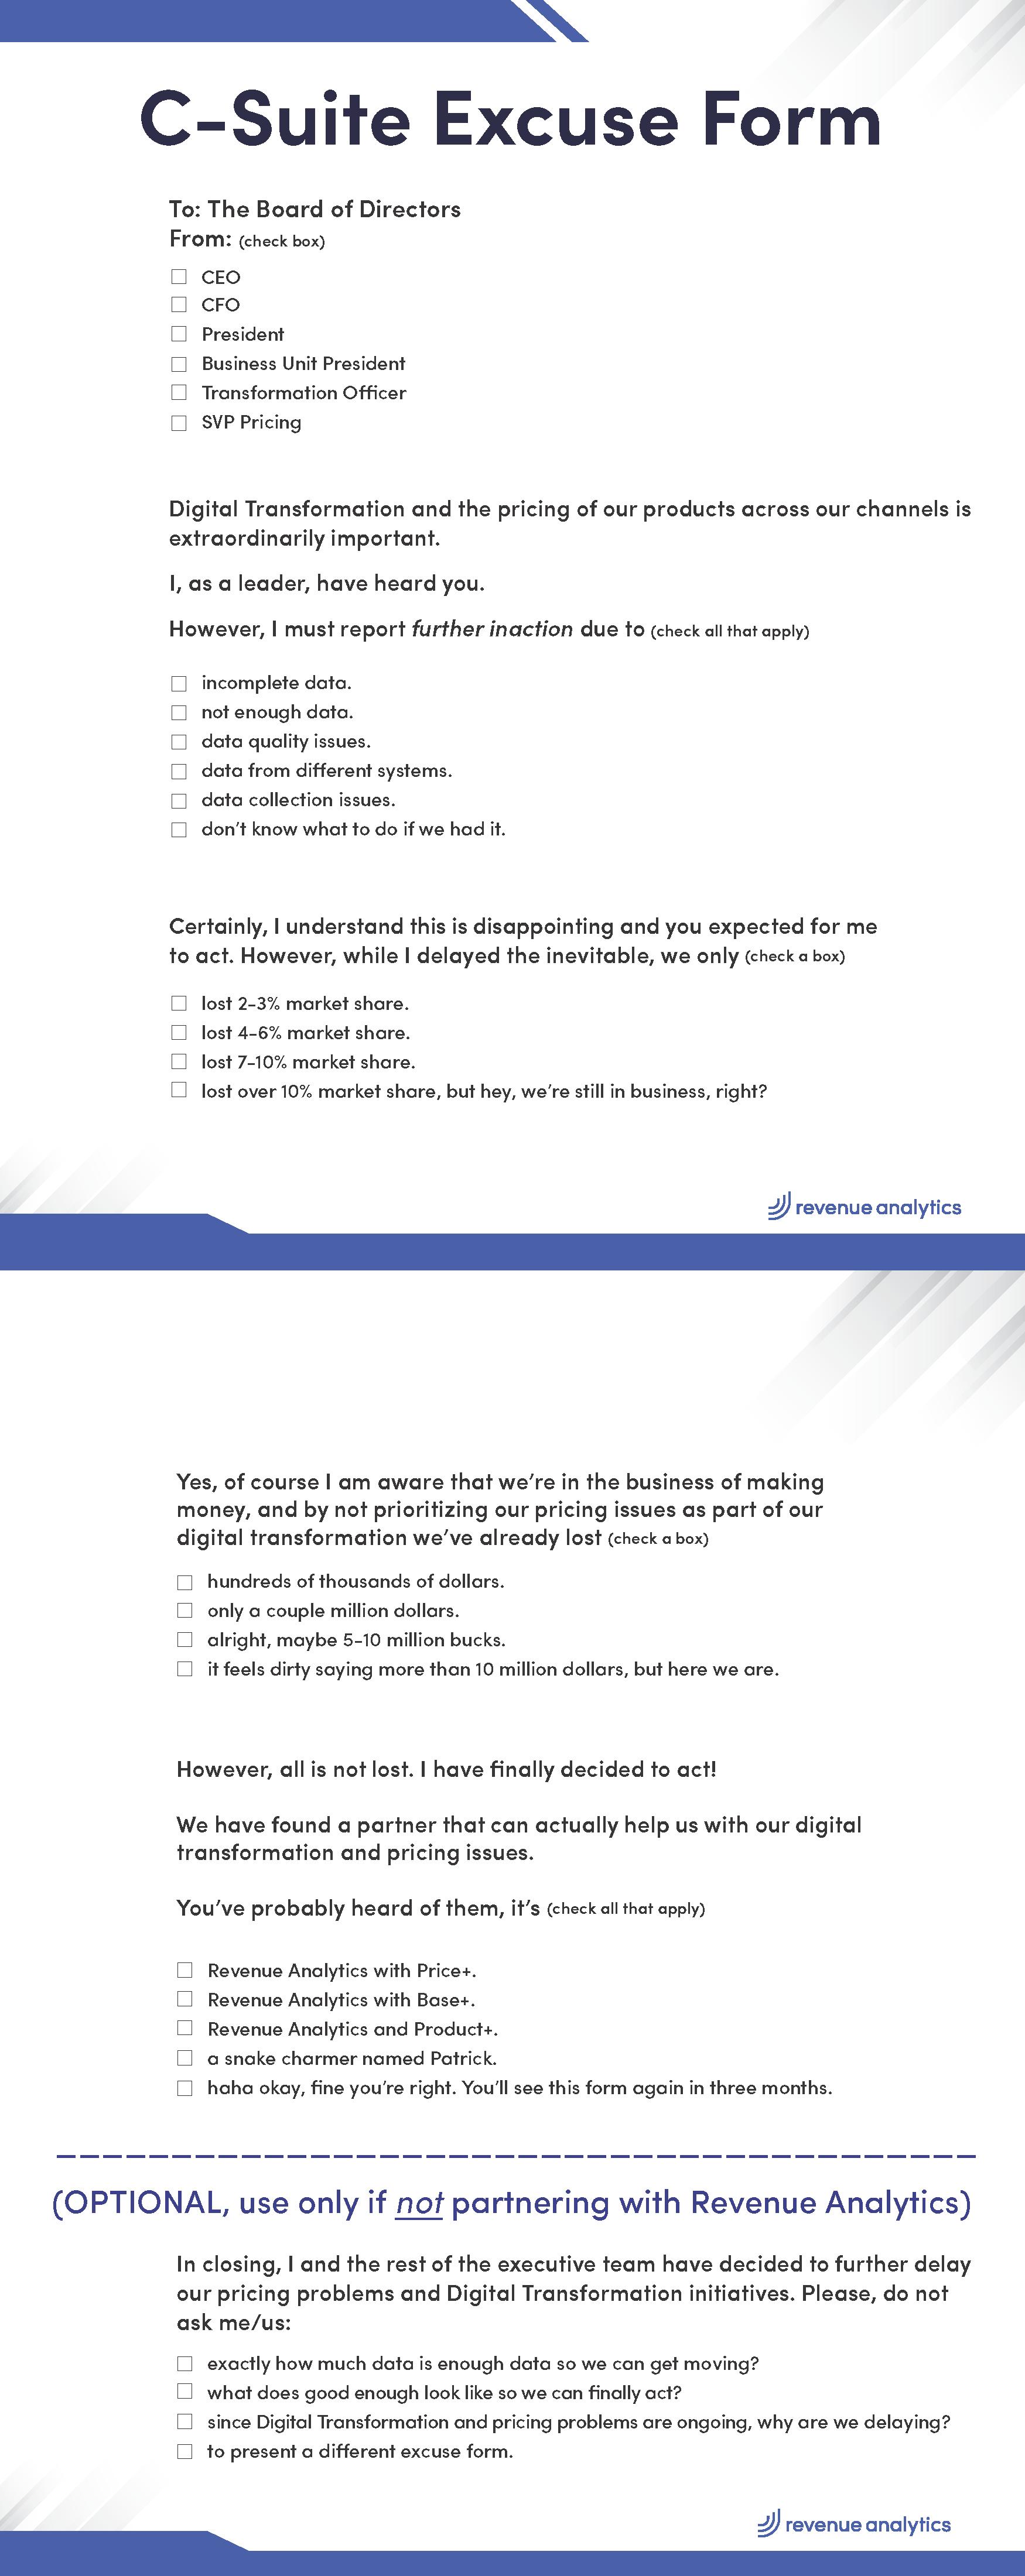 Revene Analytics C-Suite Excuse Form